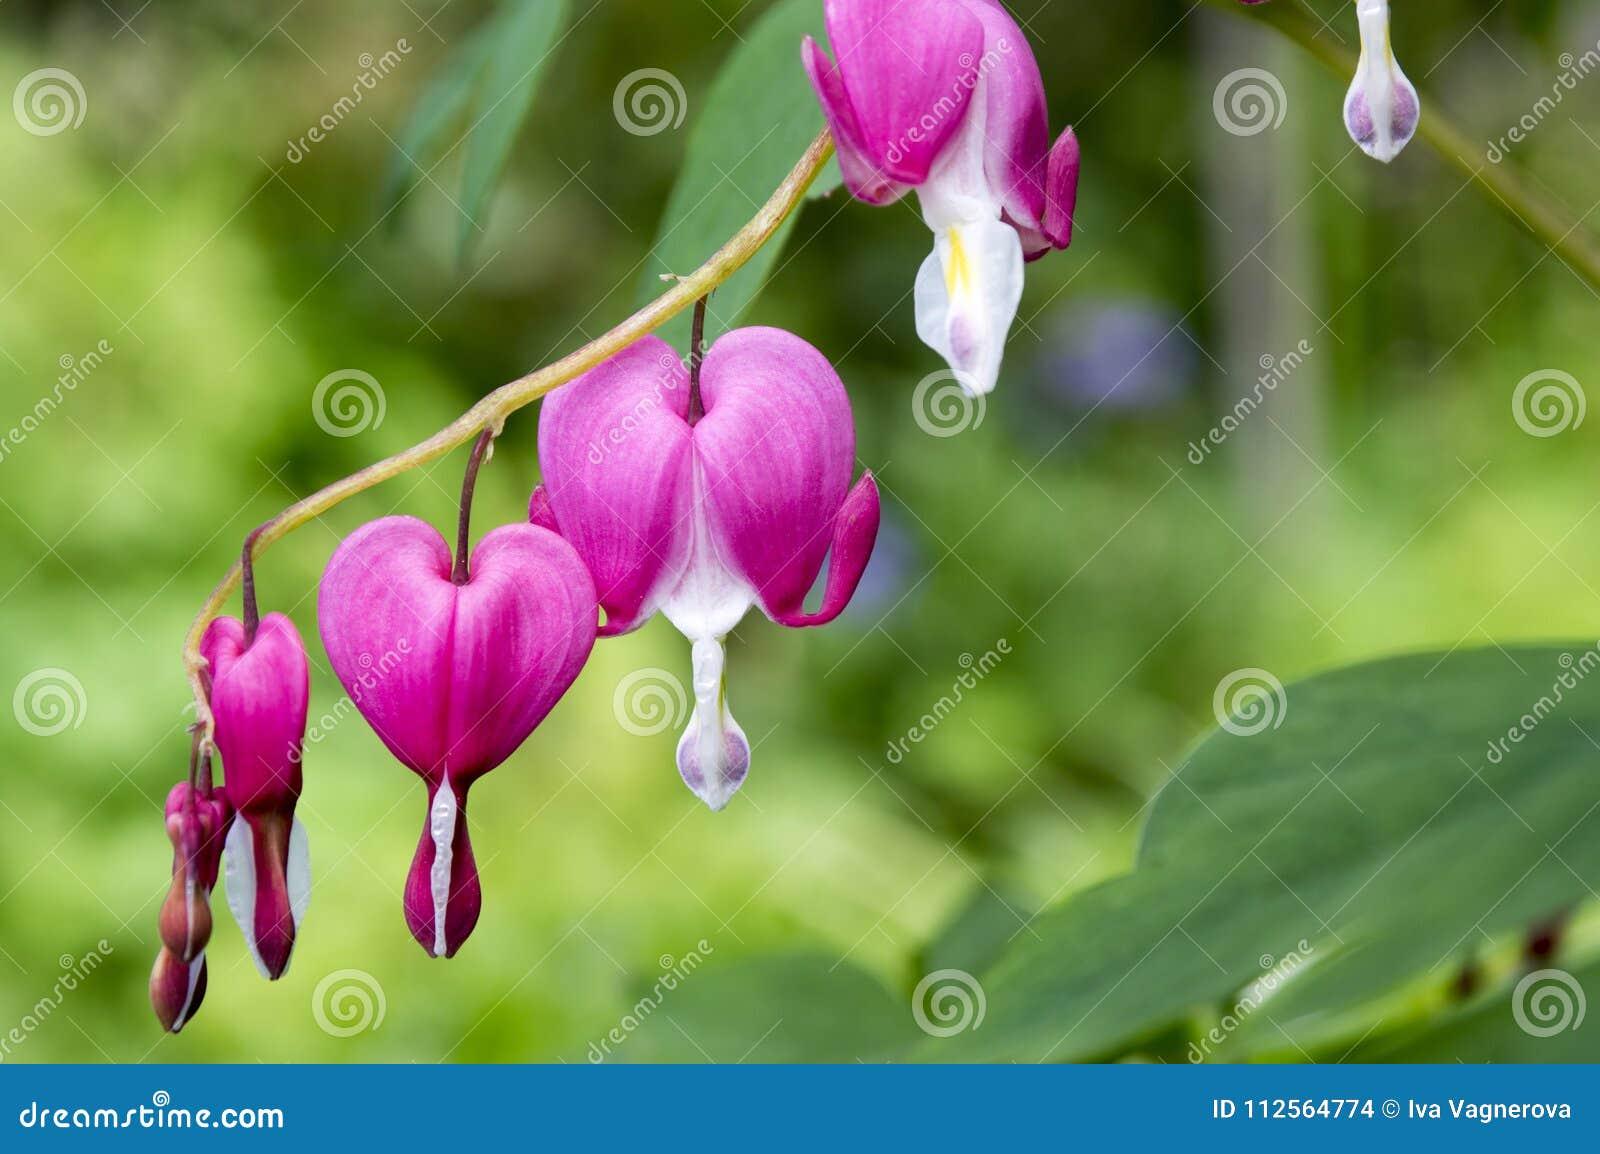 Dicentra Spectabilis Asian Bleeding Hearts Heart Shaped Flowers